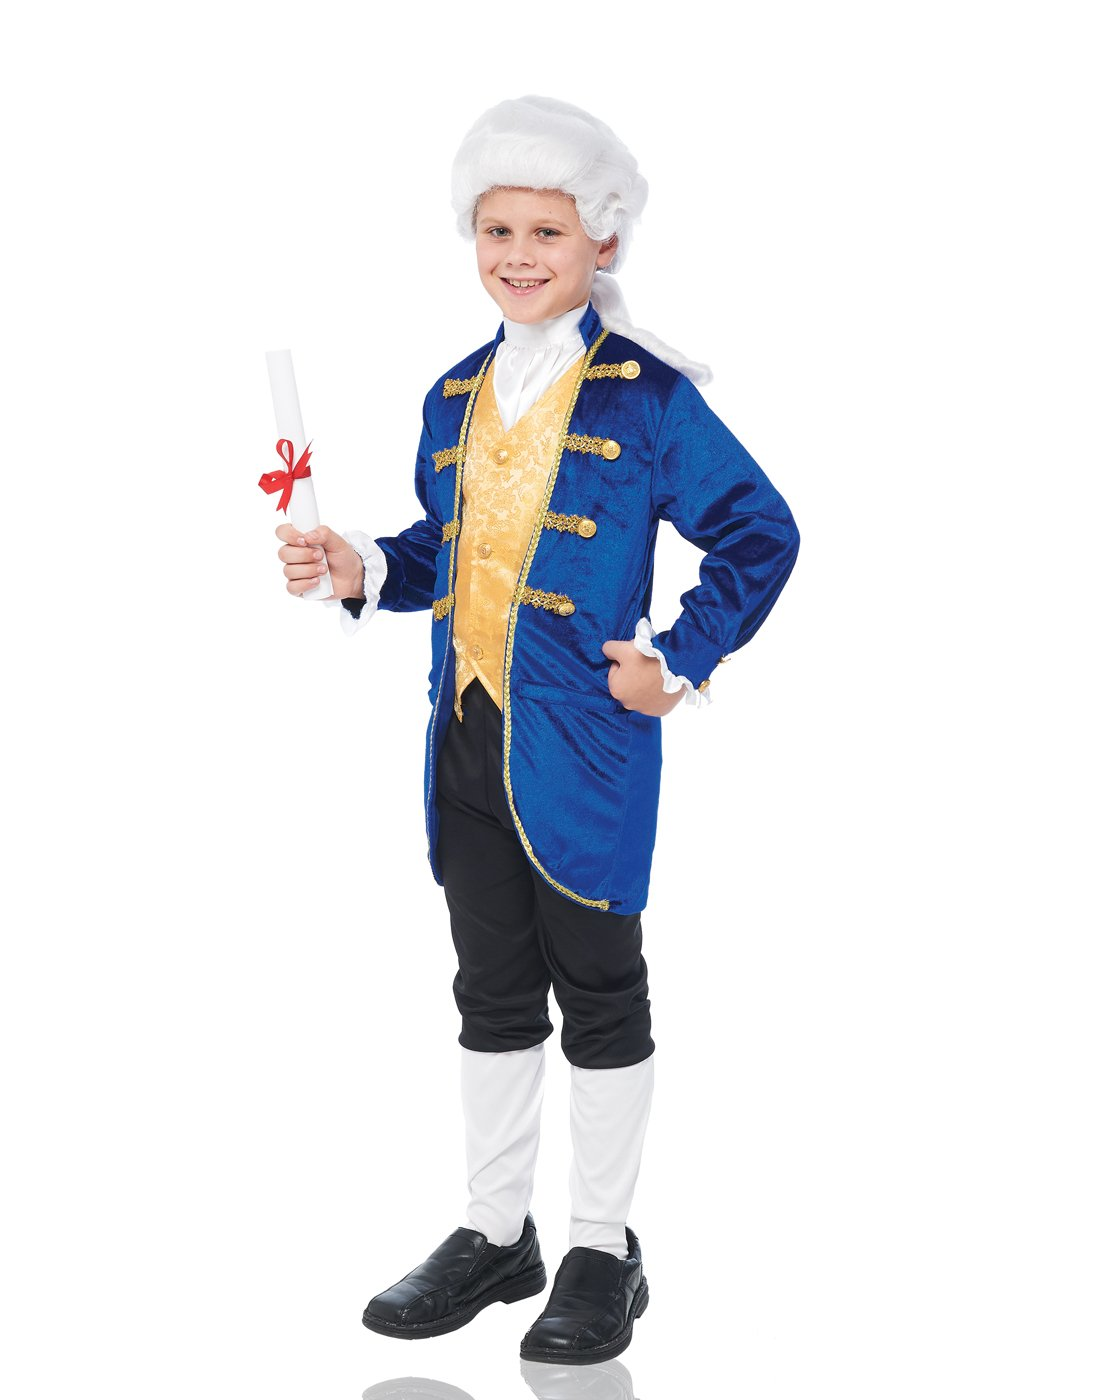 Costume Culture By Franco Llc Aristocrat Costume S (4)